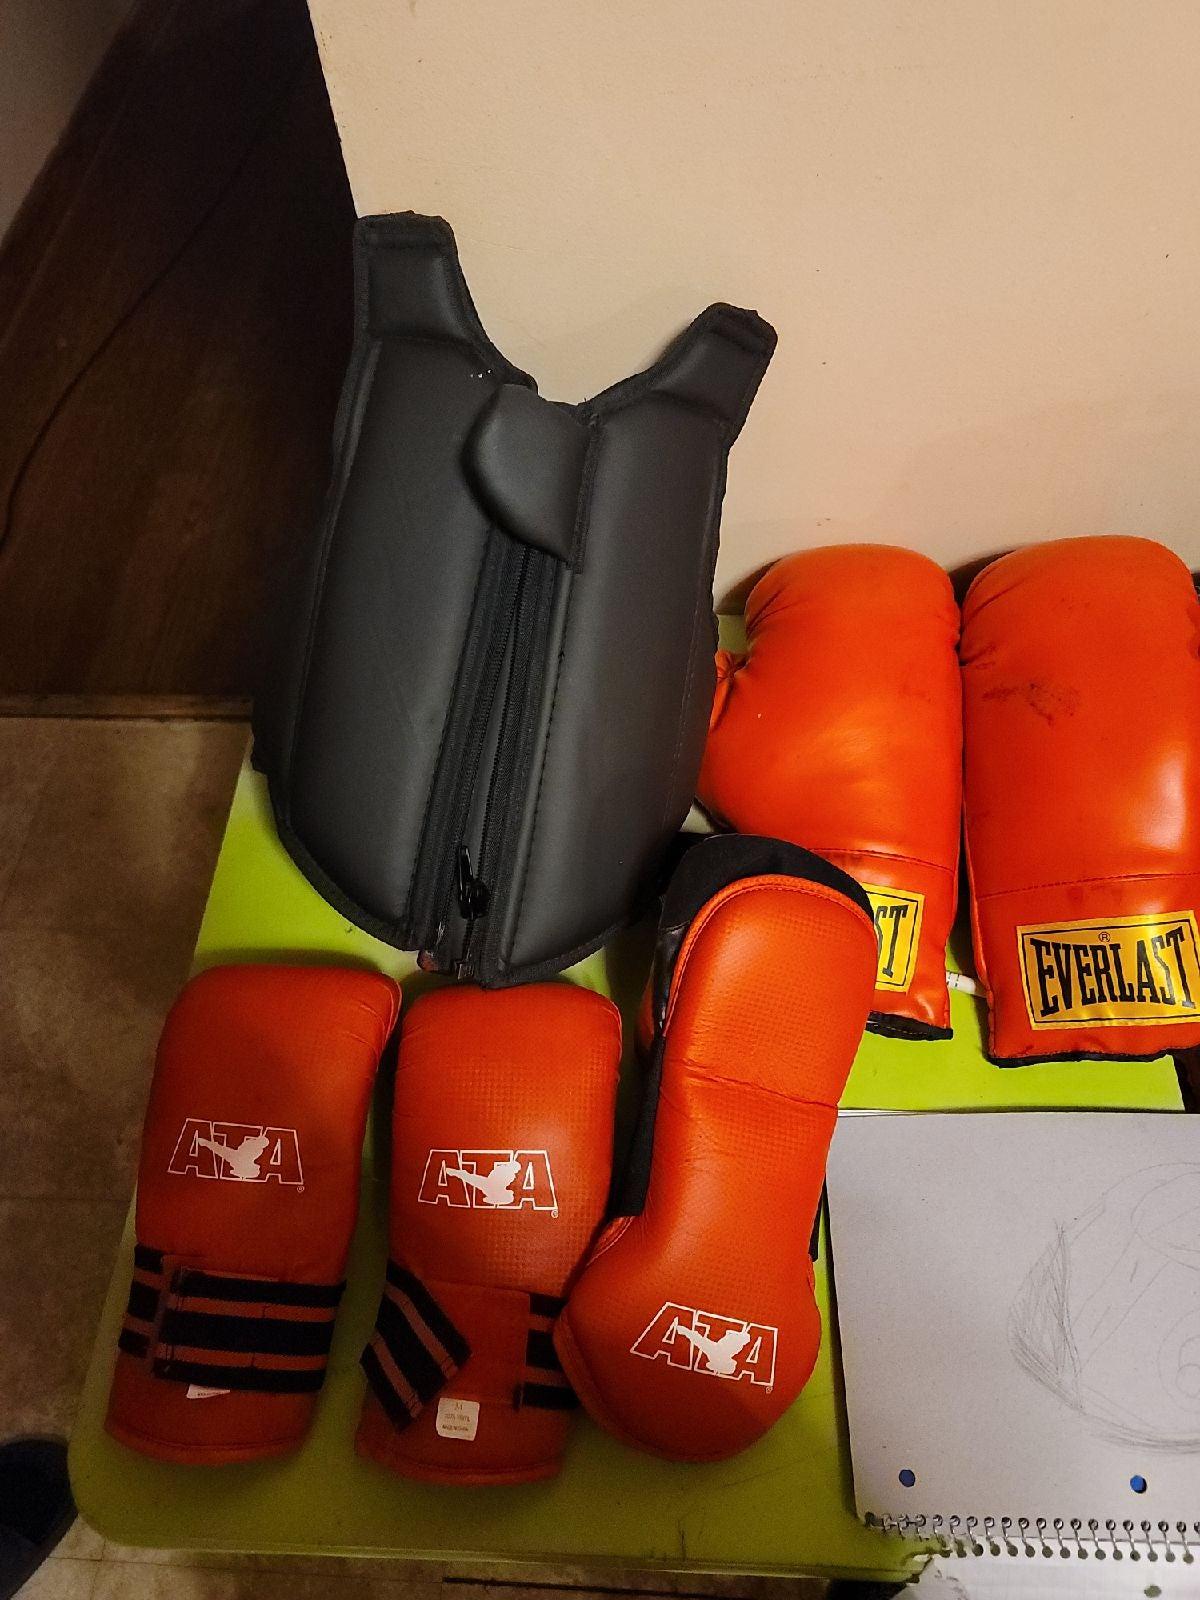 Everlast boxing gear